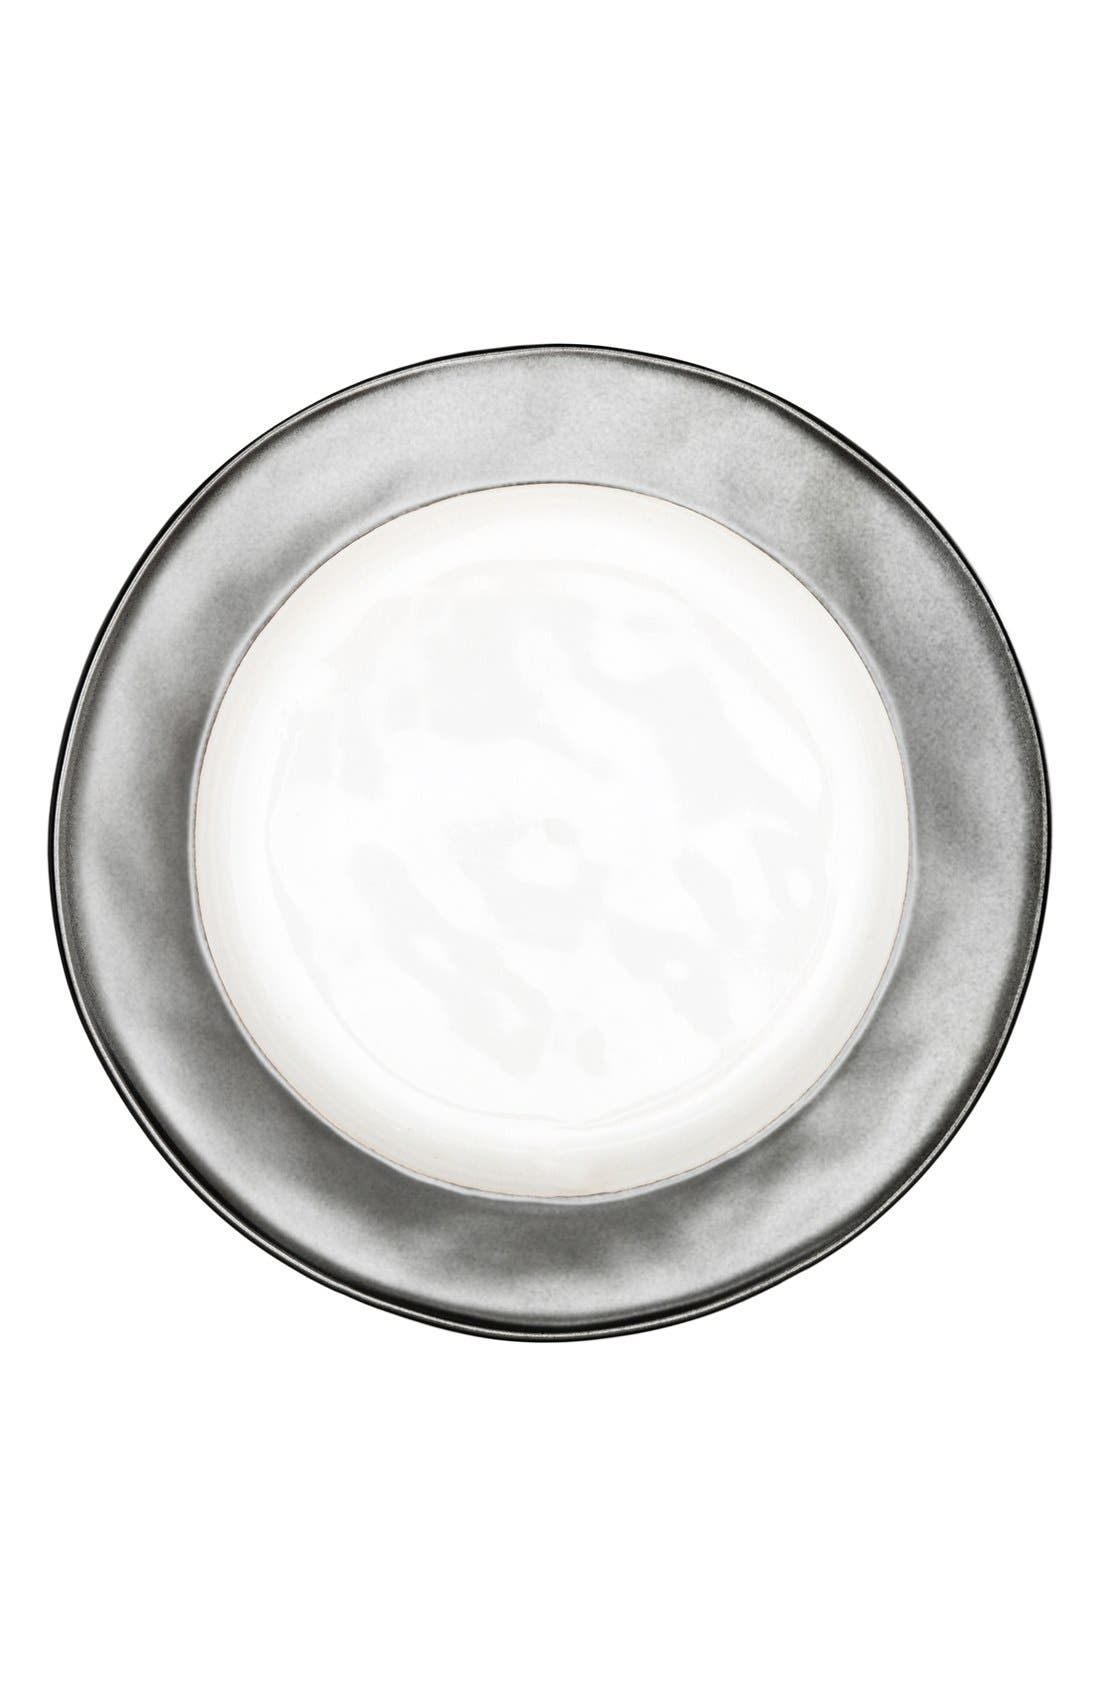 'Emerson' Ceramic Dessert Plate,                             Main thumbnail 1, color,                             PEWTER/ WHITE